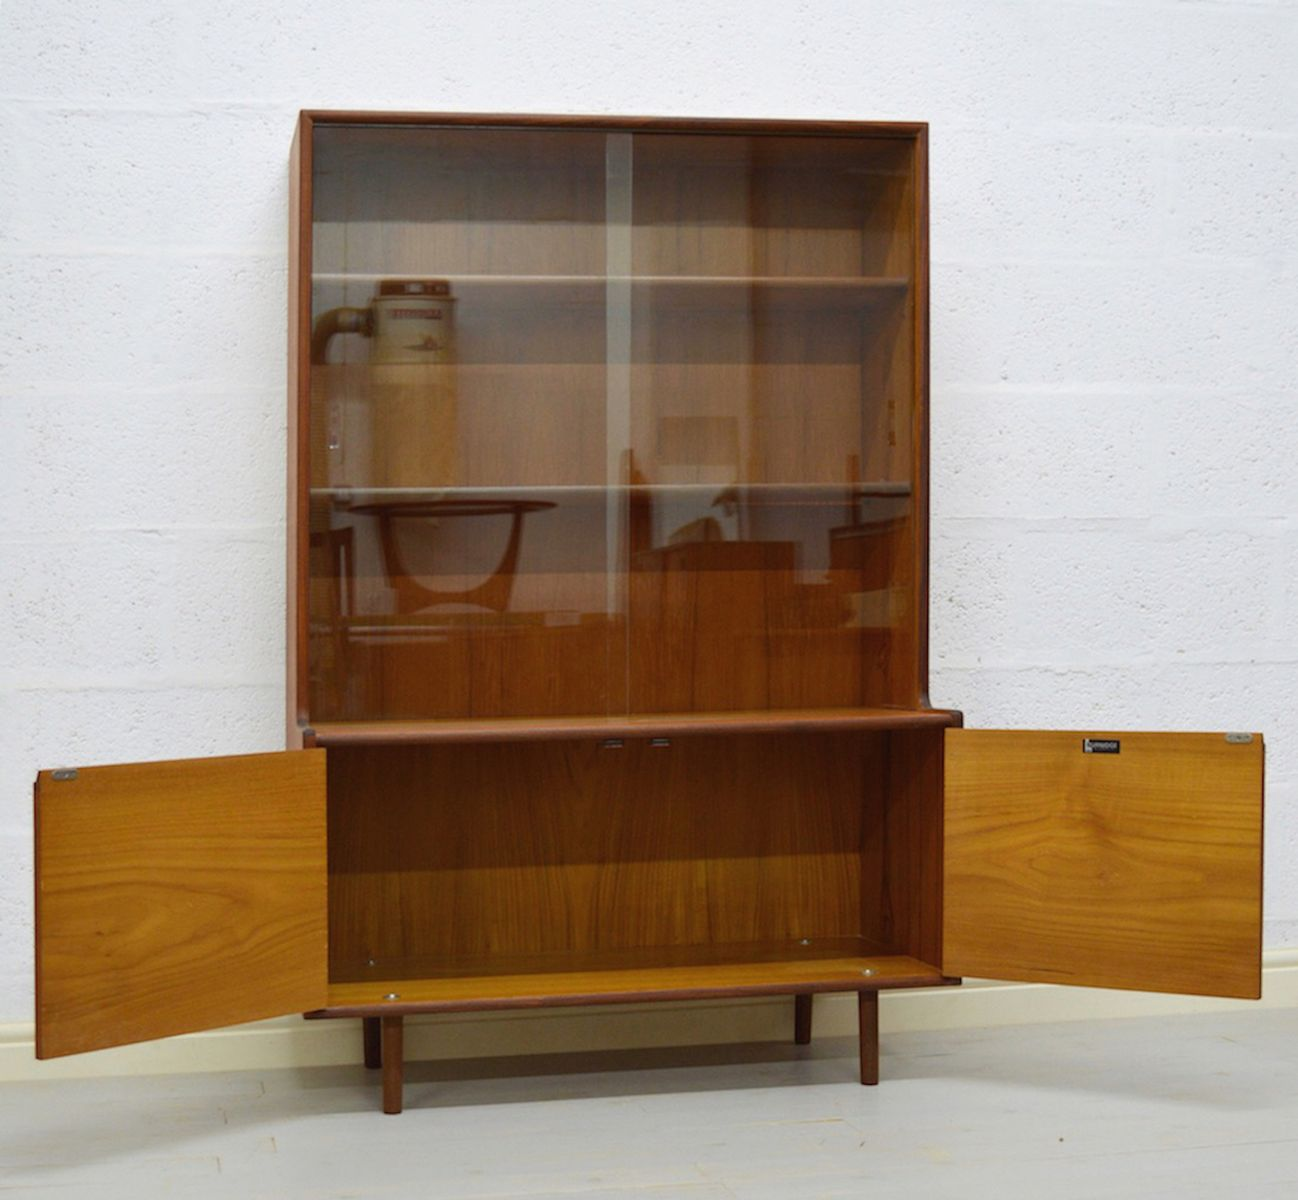 biblioth que vintage portes vitr es en teck et en verre par turnidge 1960s en vente sur pamono. Black Bedroom Furniture Sets. Home Design Ideas